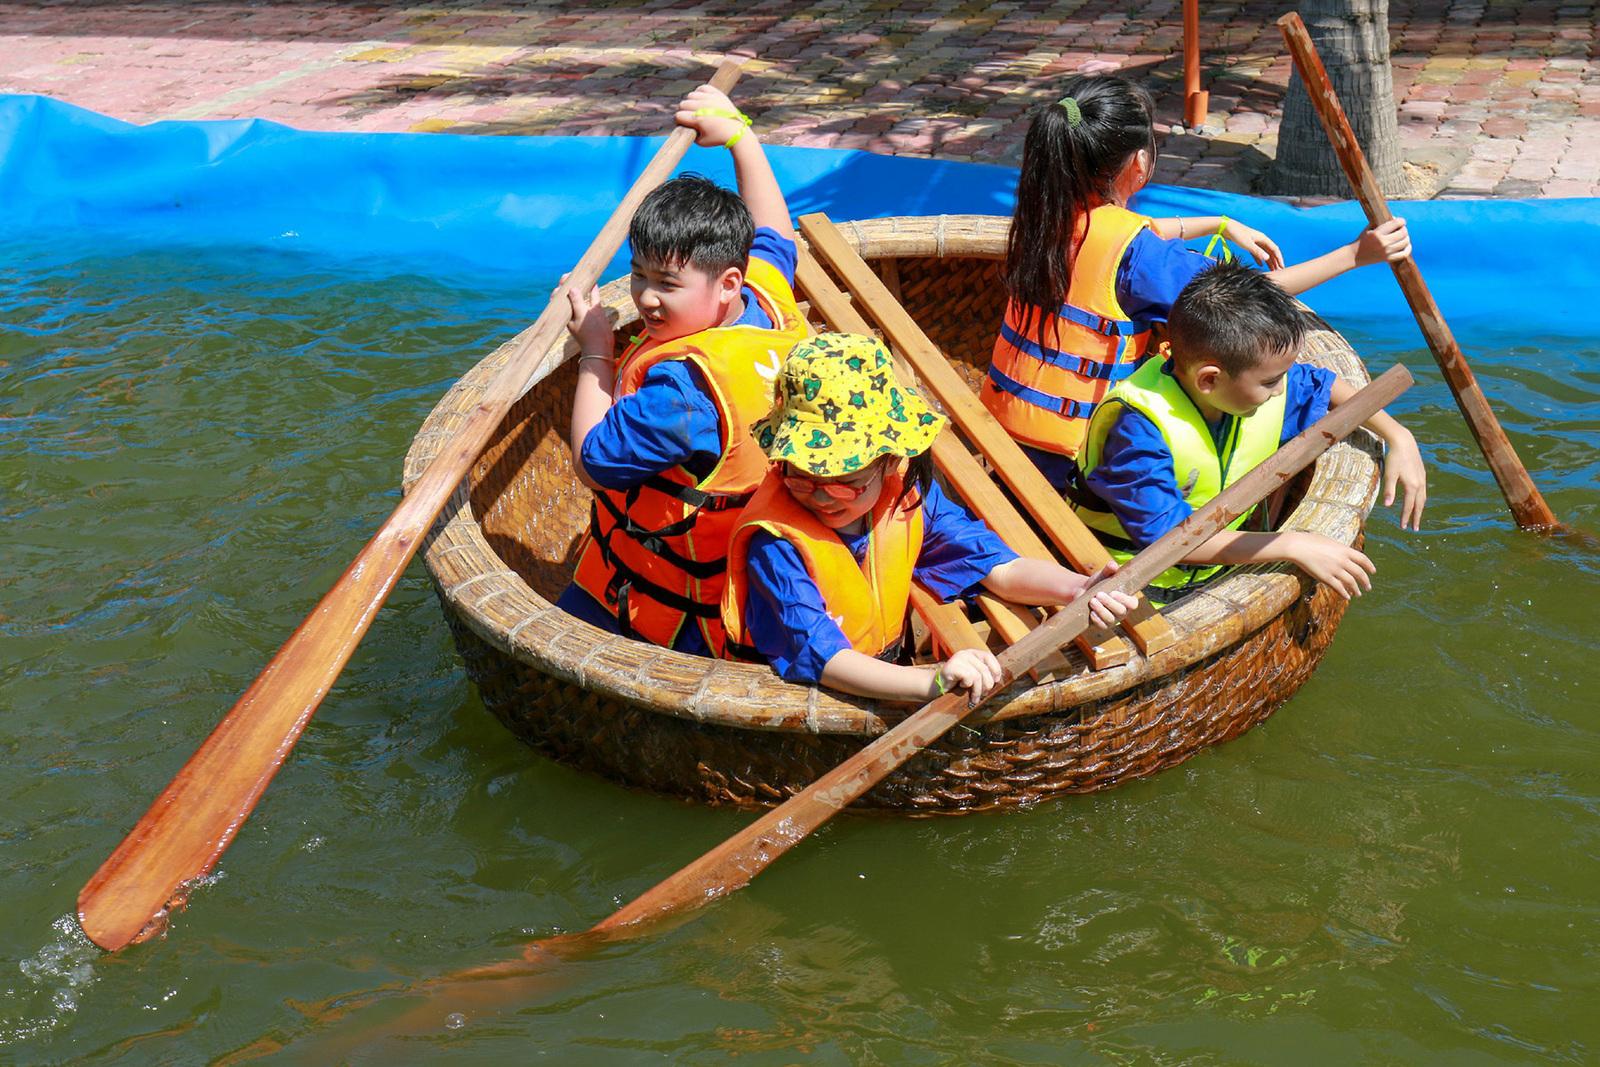 VnE-BinhDuong-KDLDaiNam7-6735-1605099938